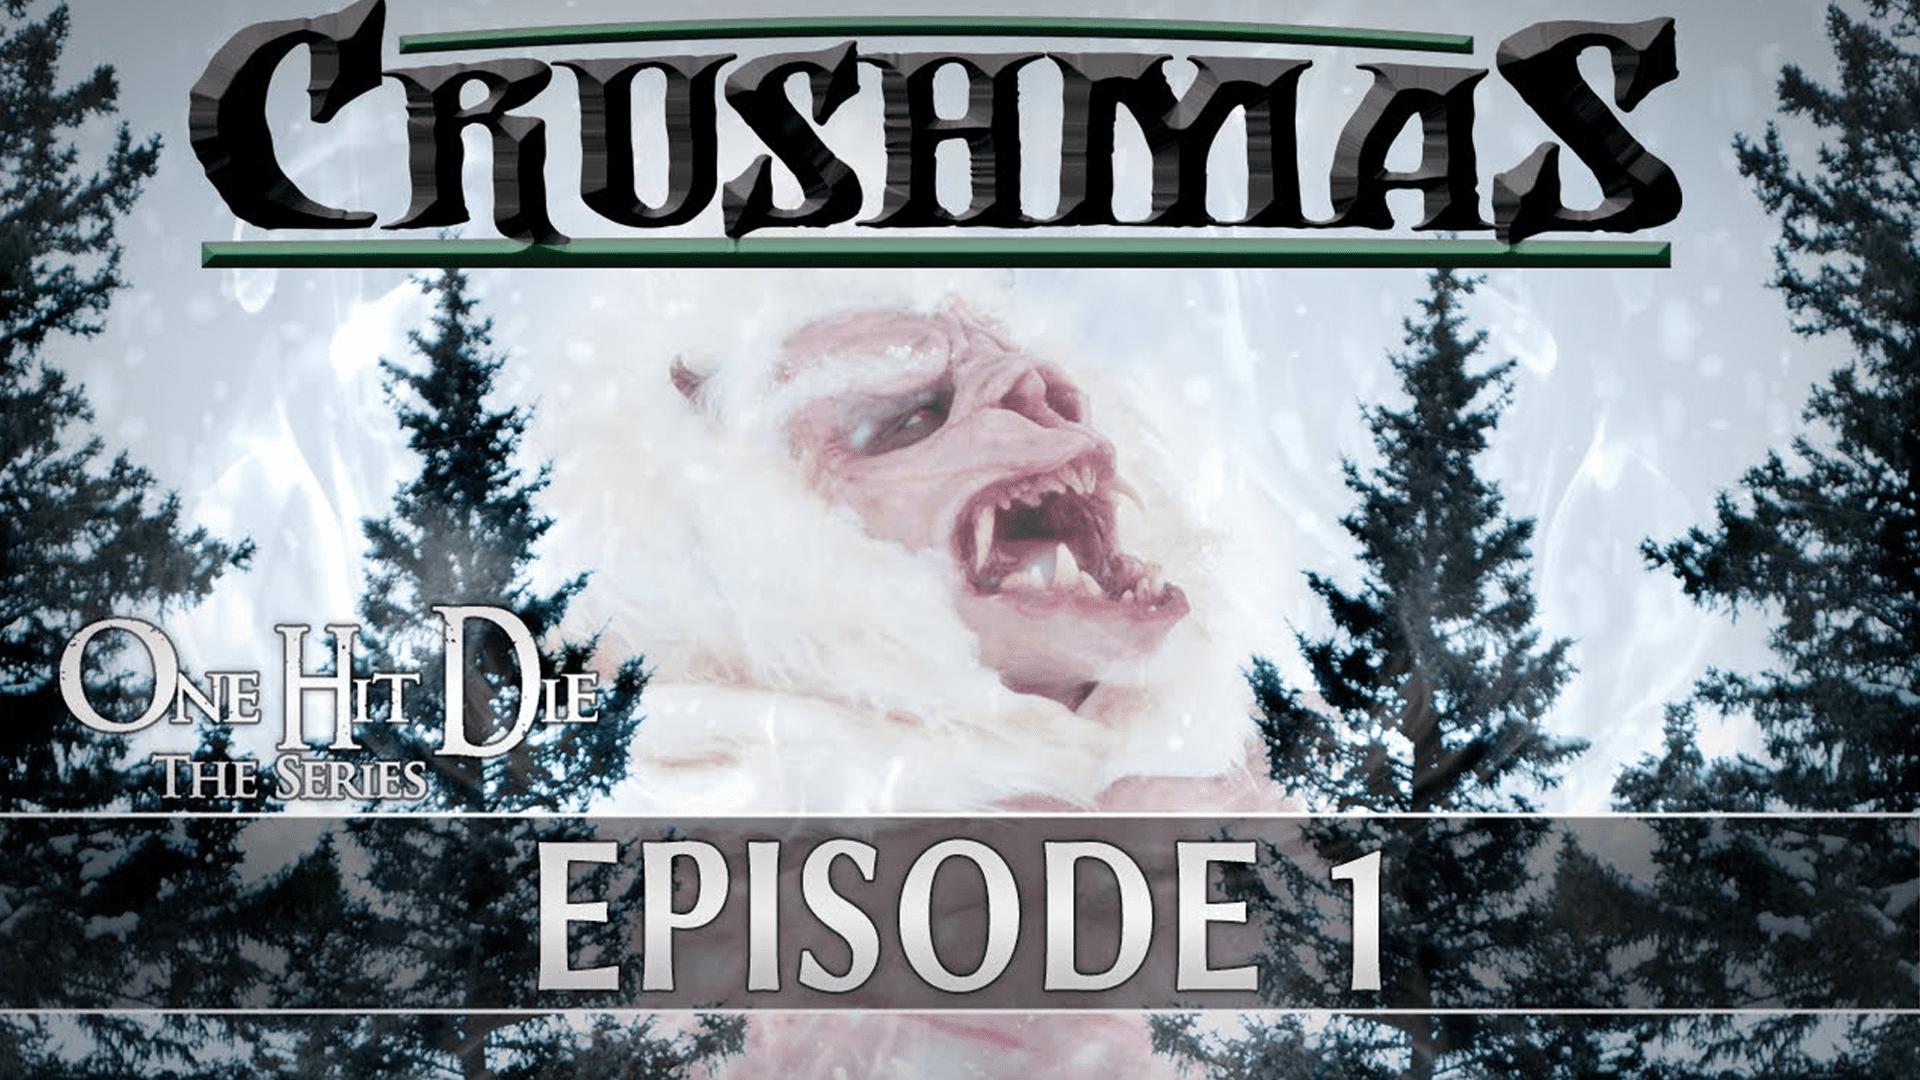 One Hit Die Crushmas Episode 1